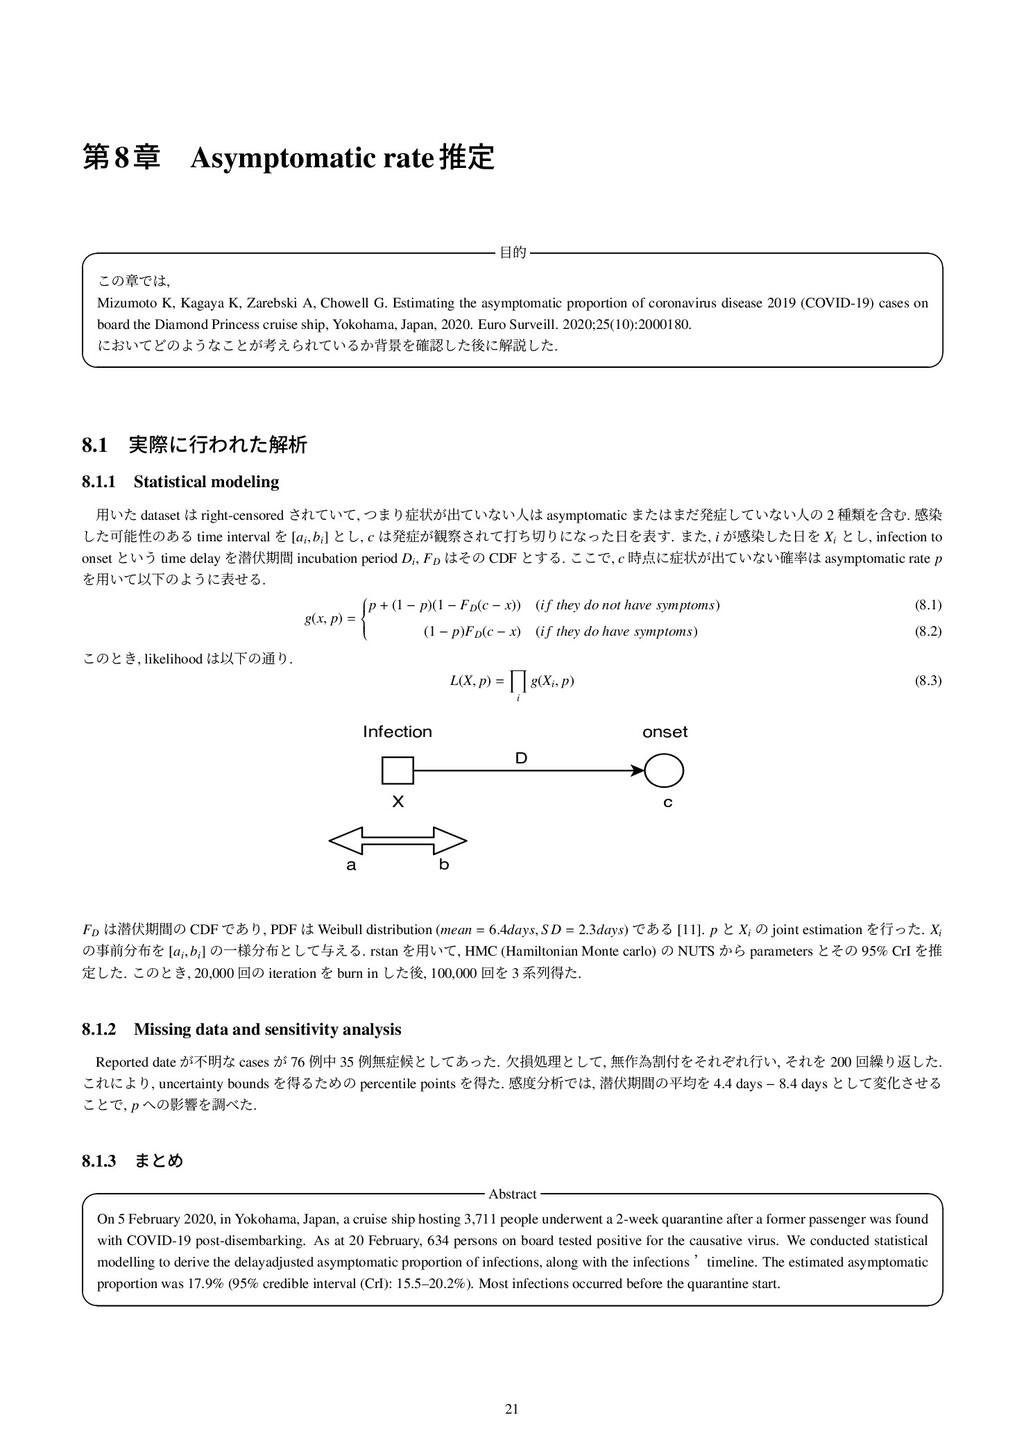 ୈ8ষ Asymptomatic rateਪఆ త   ͜ͷষͰ, Mizumoto ...